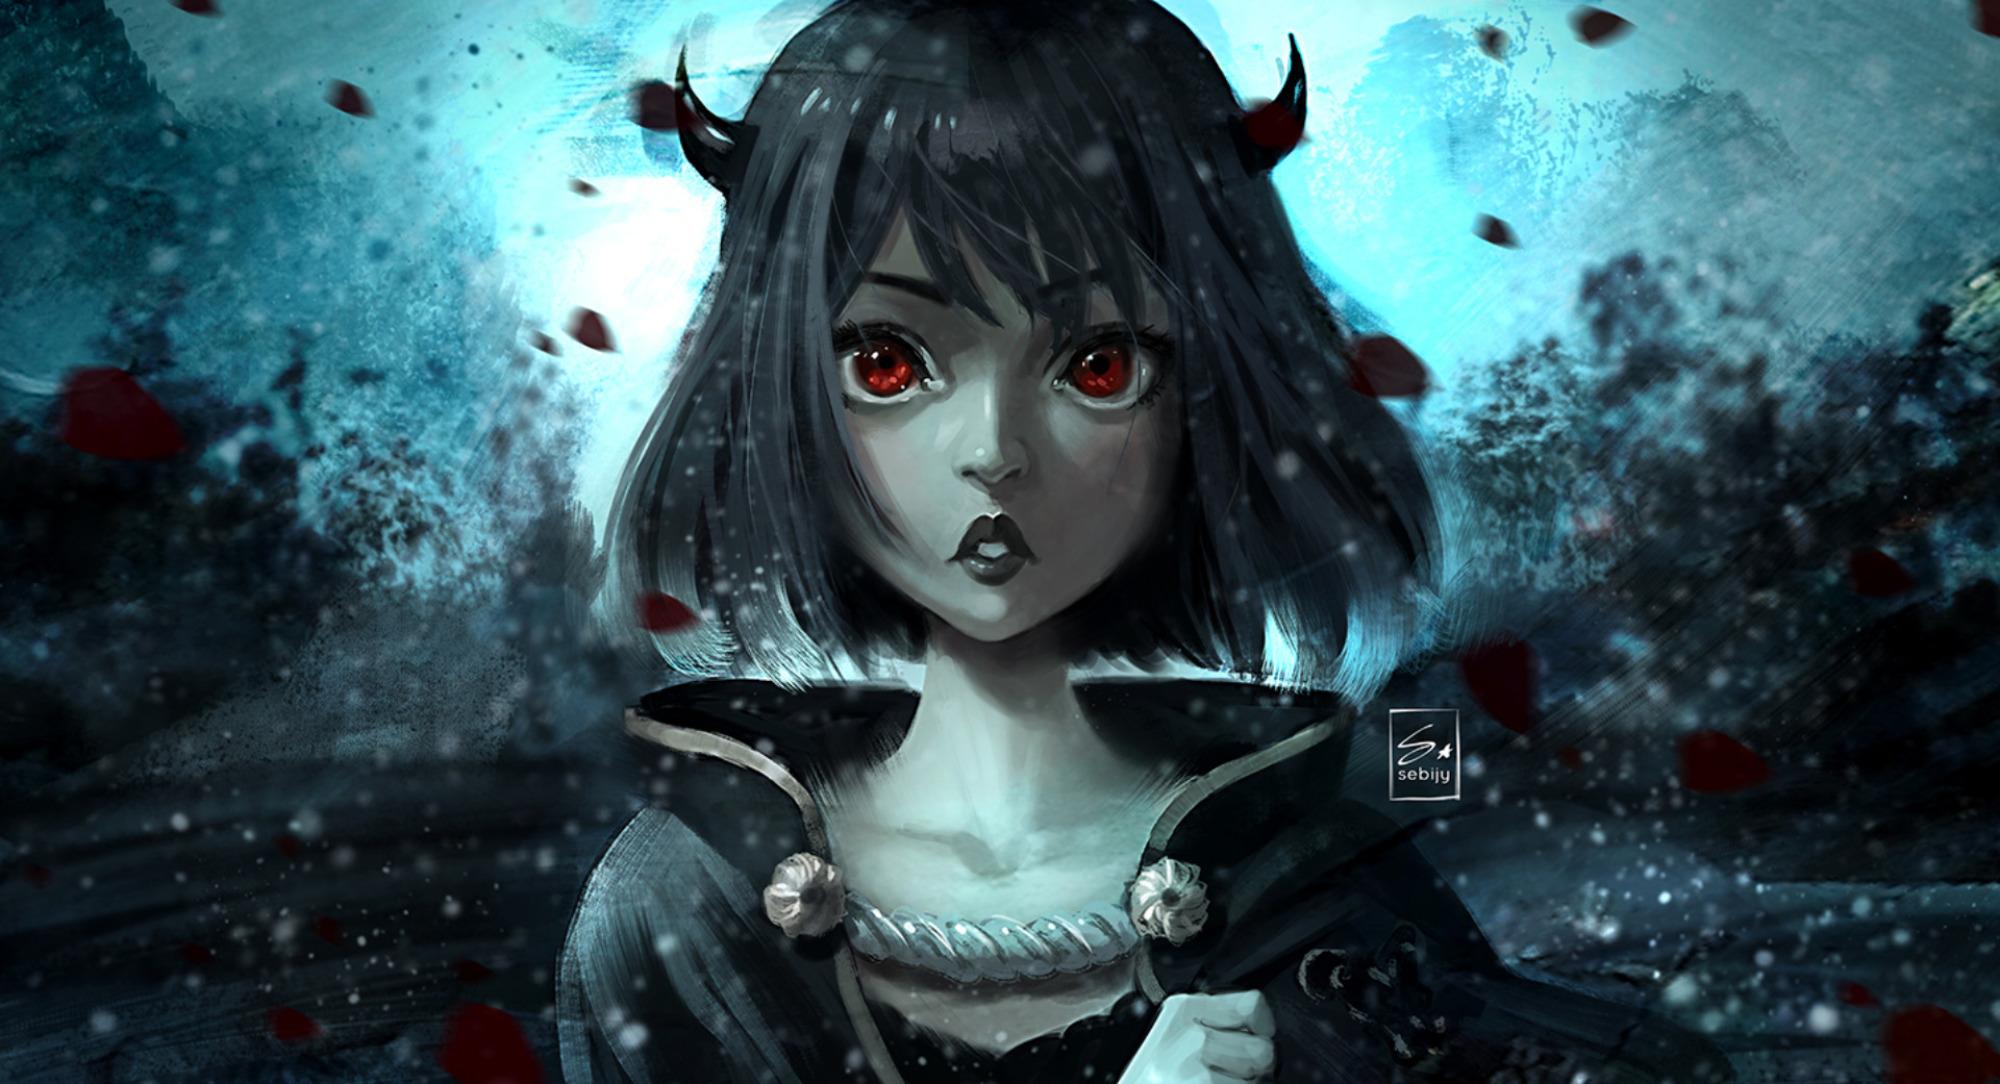 Black Clover HD Wallpaper | Background Image | 2000x1084 ...